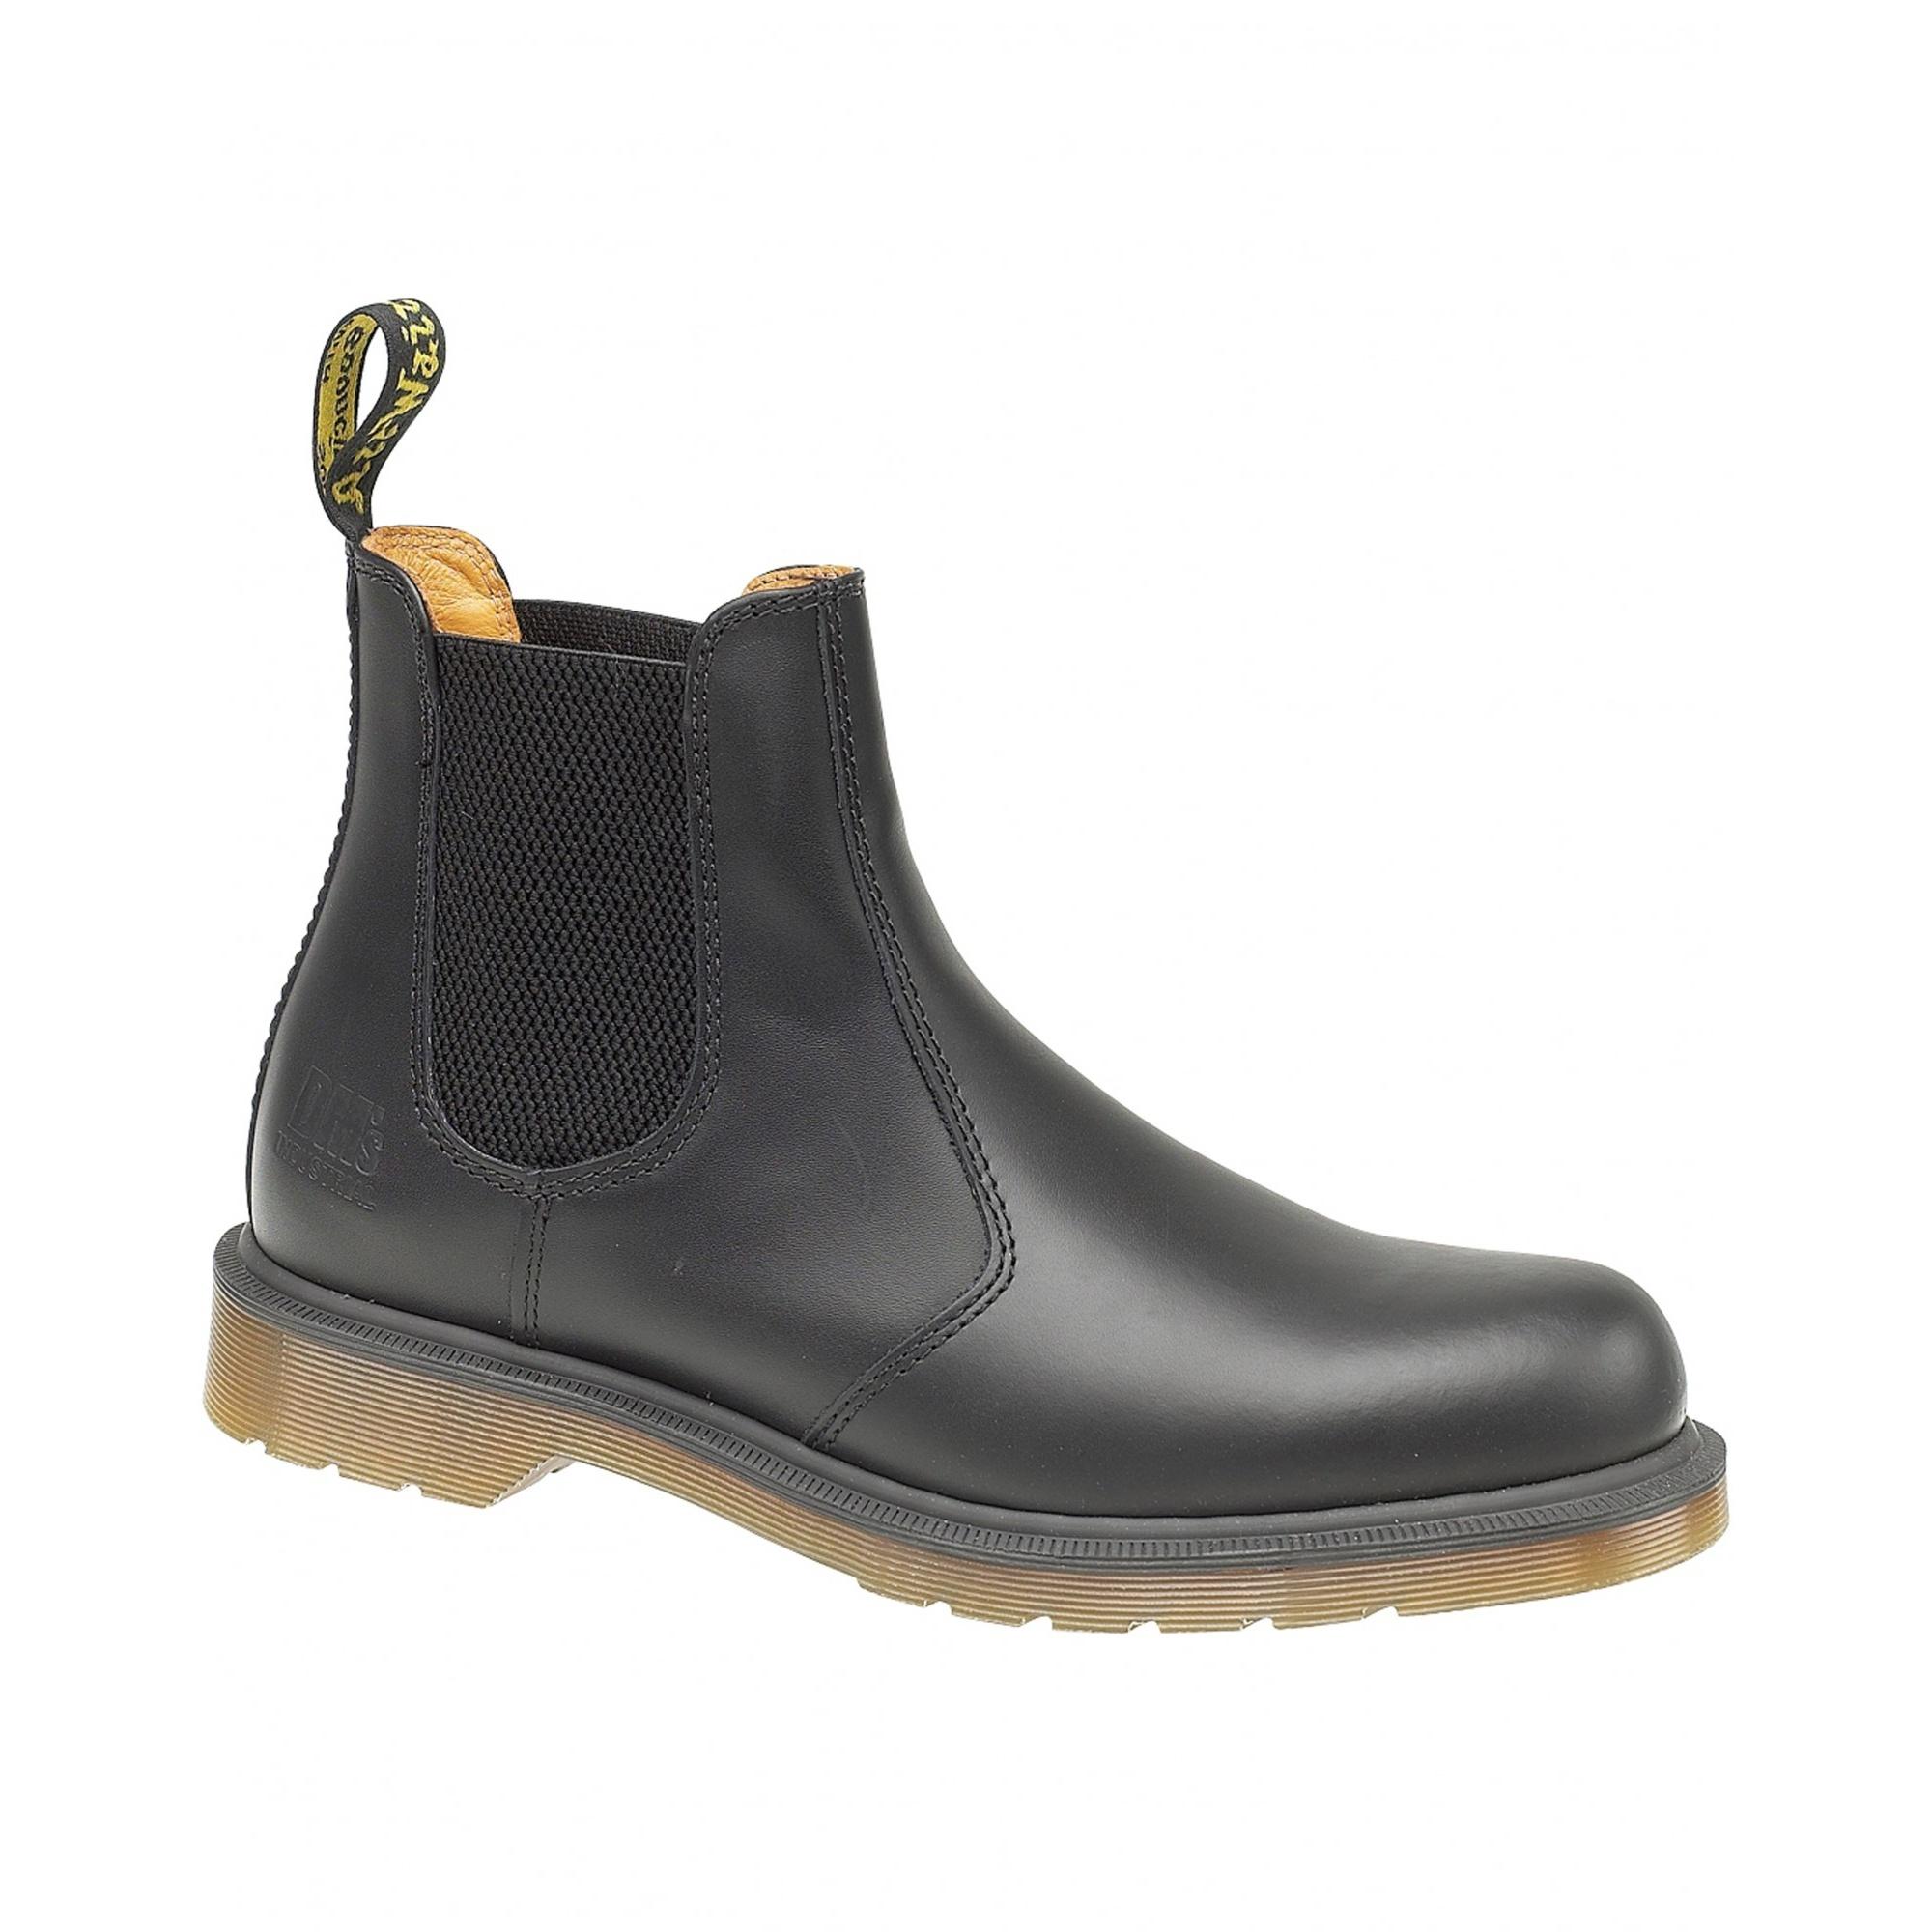 Billig B8250 gute Qualität Dr Martens B8250 Billig Stiefel (FS893) 52963c